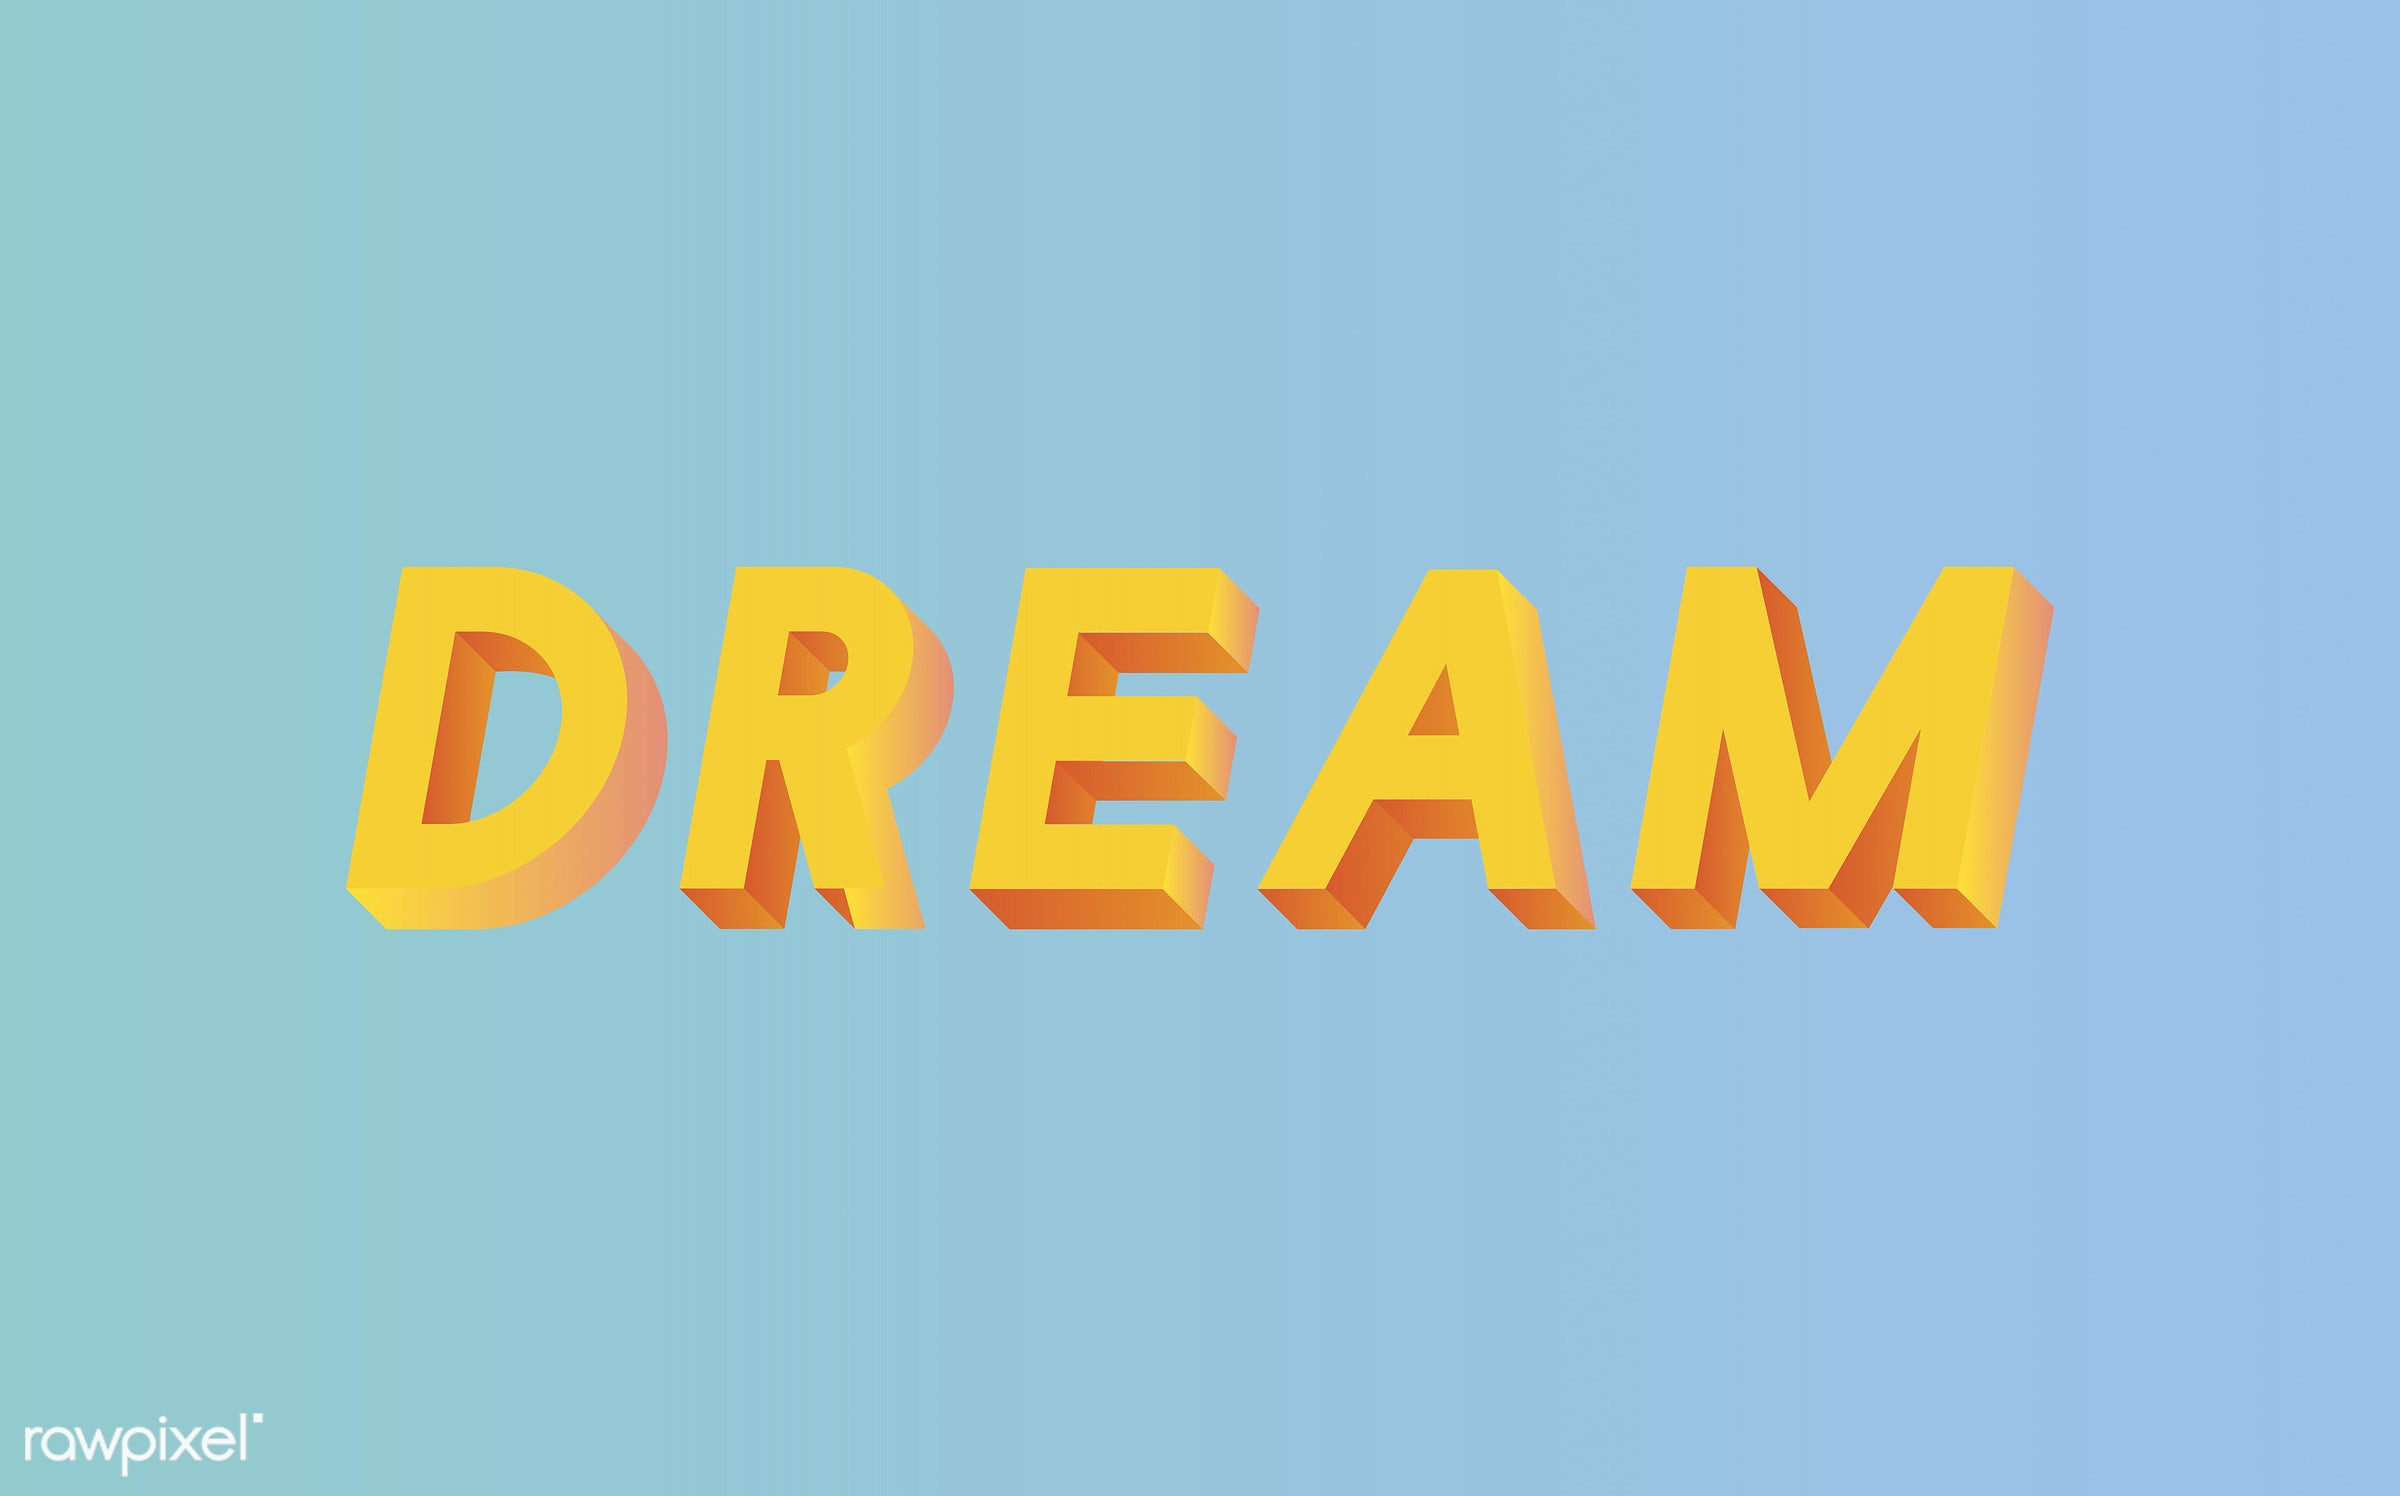 neon, colorful, 3d, three dimensional, vector, illustration, graphic, word, blue, yellow, dream, dreamer, dream big